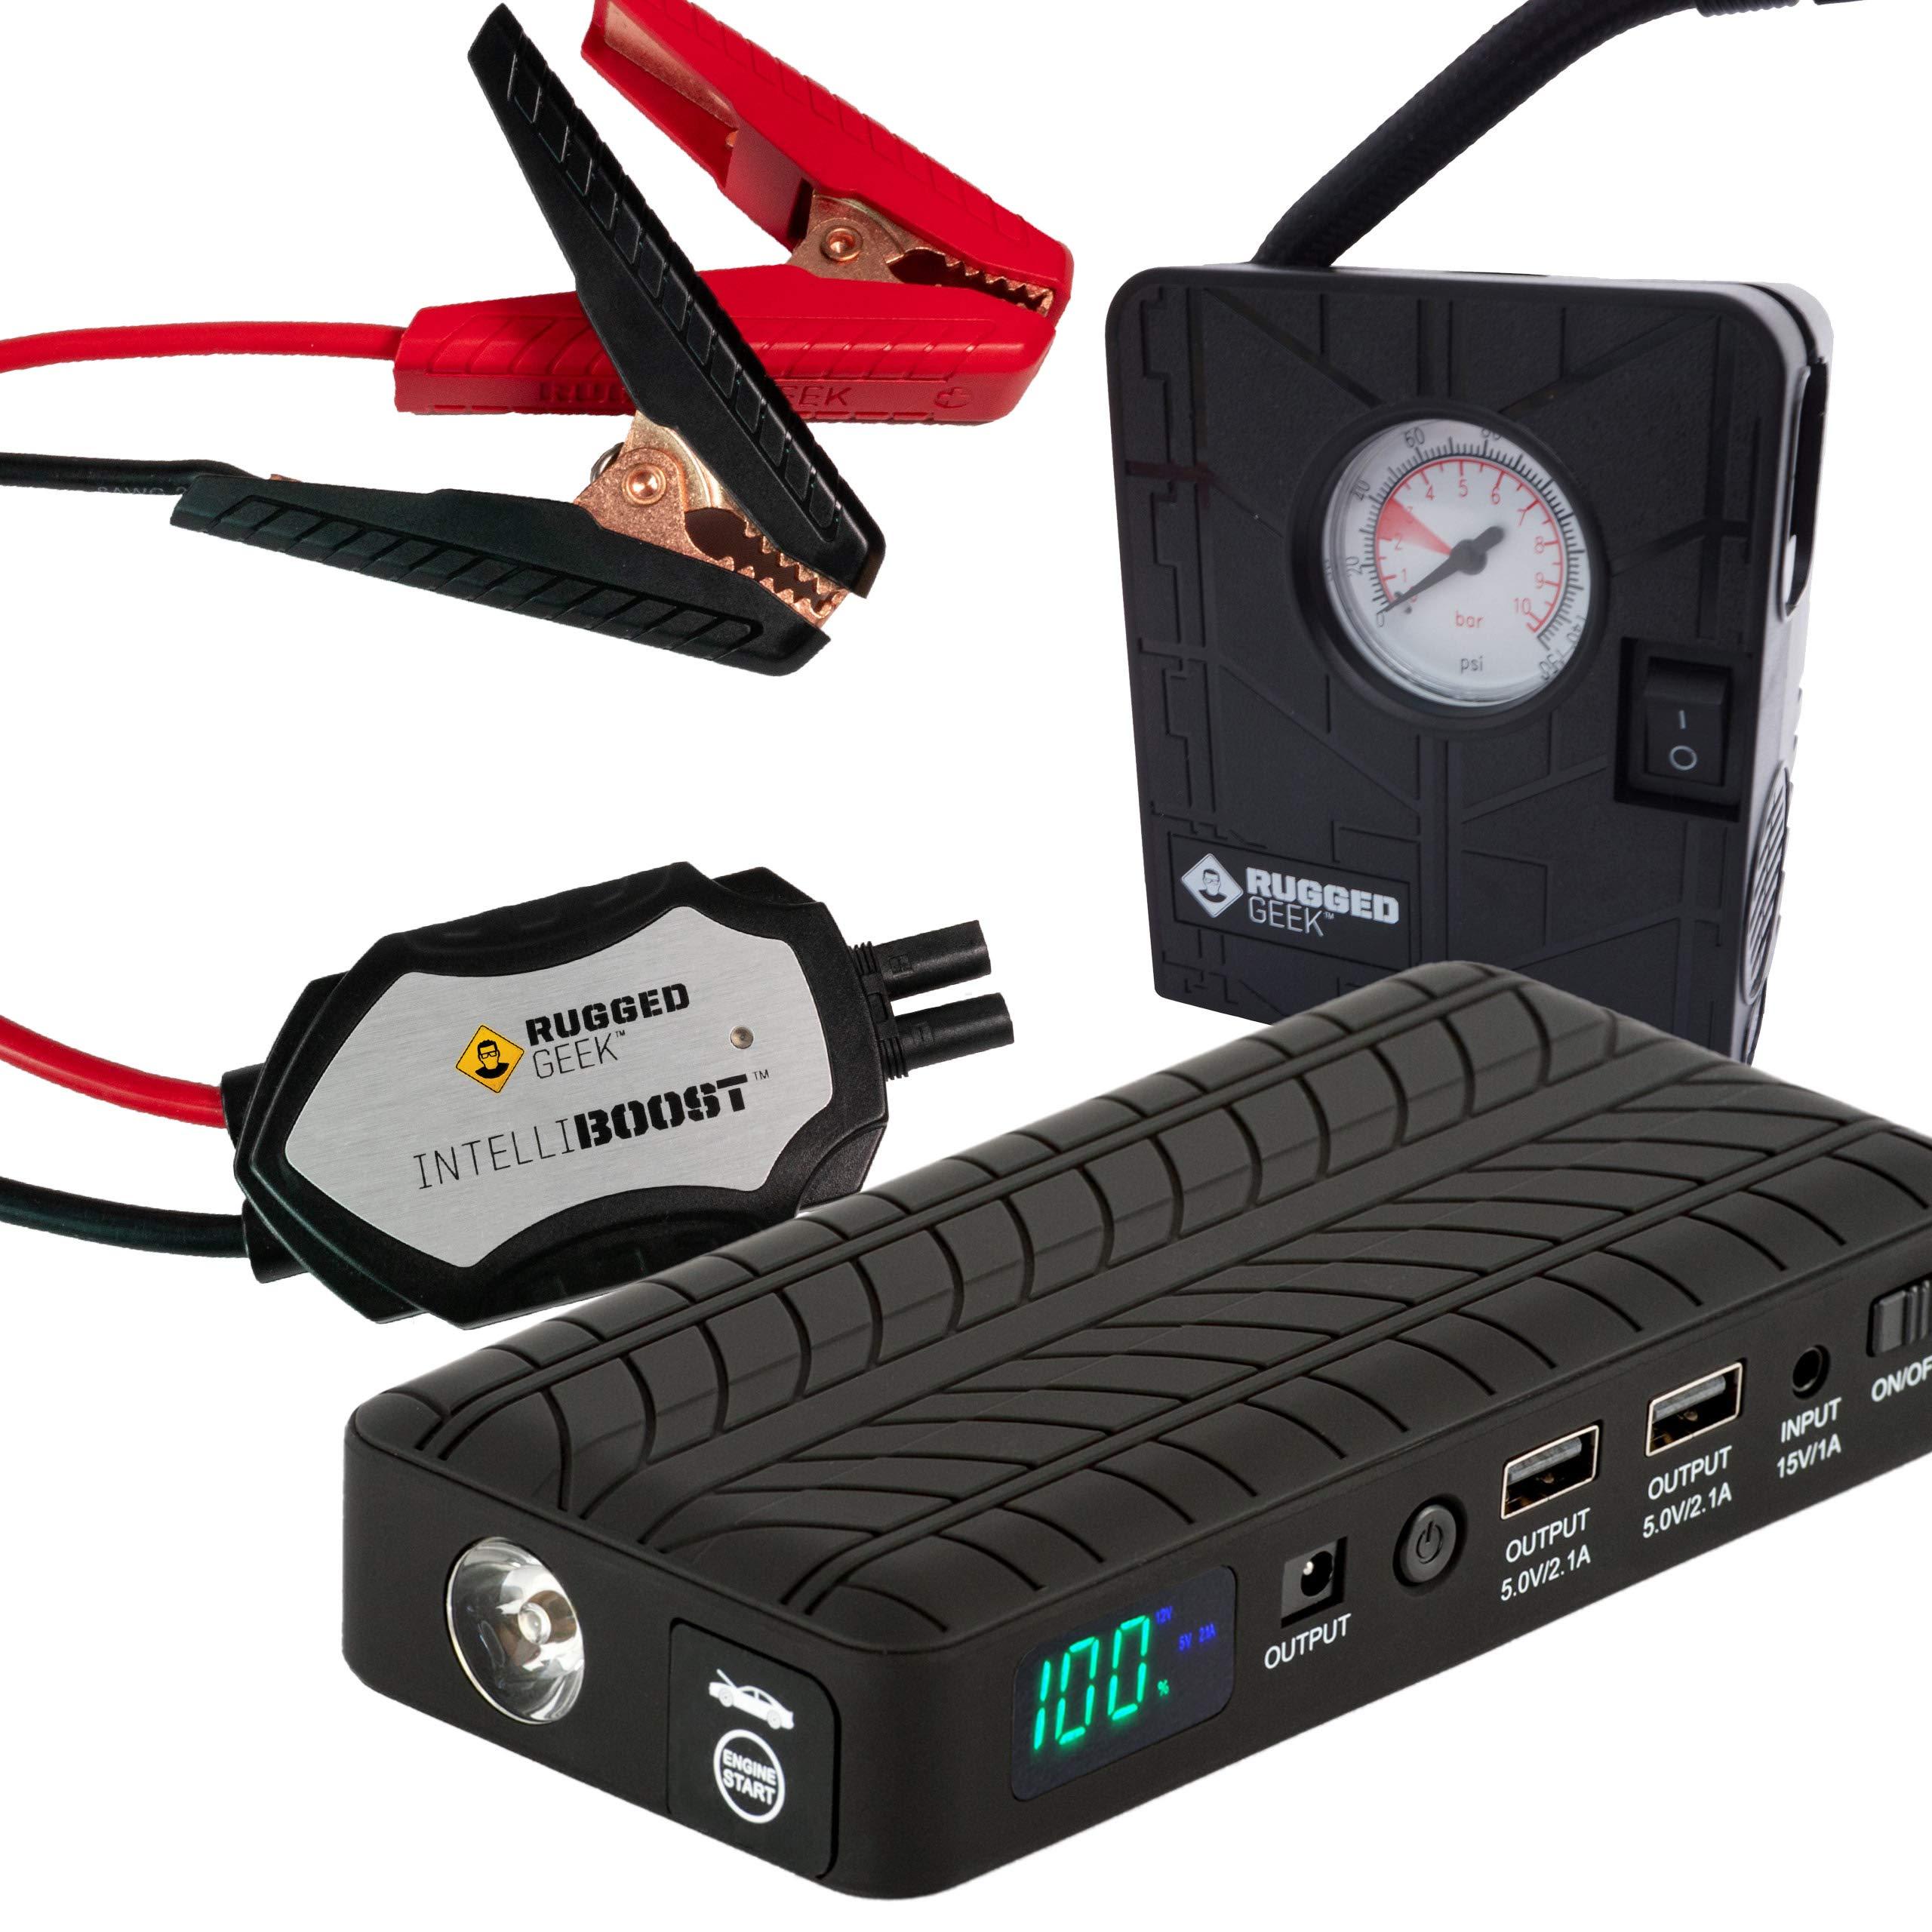 RG1000 Starter INTELLIBOOST Flashlight COMPRESSOR